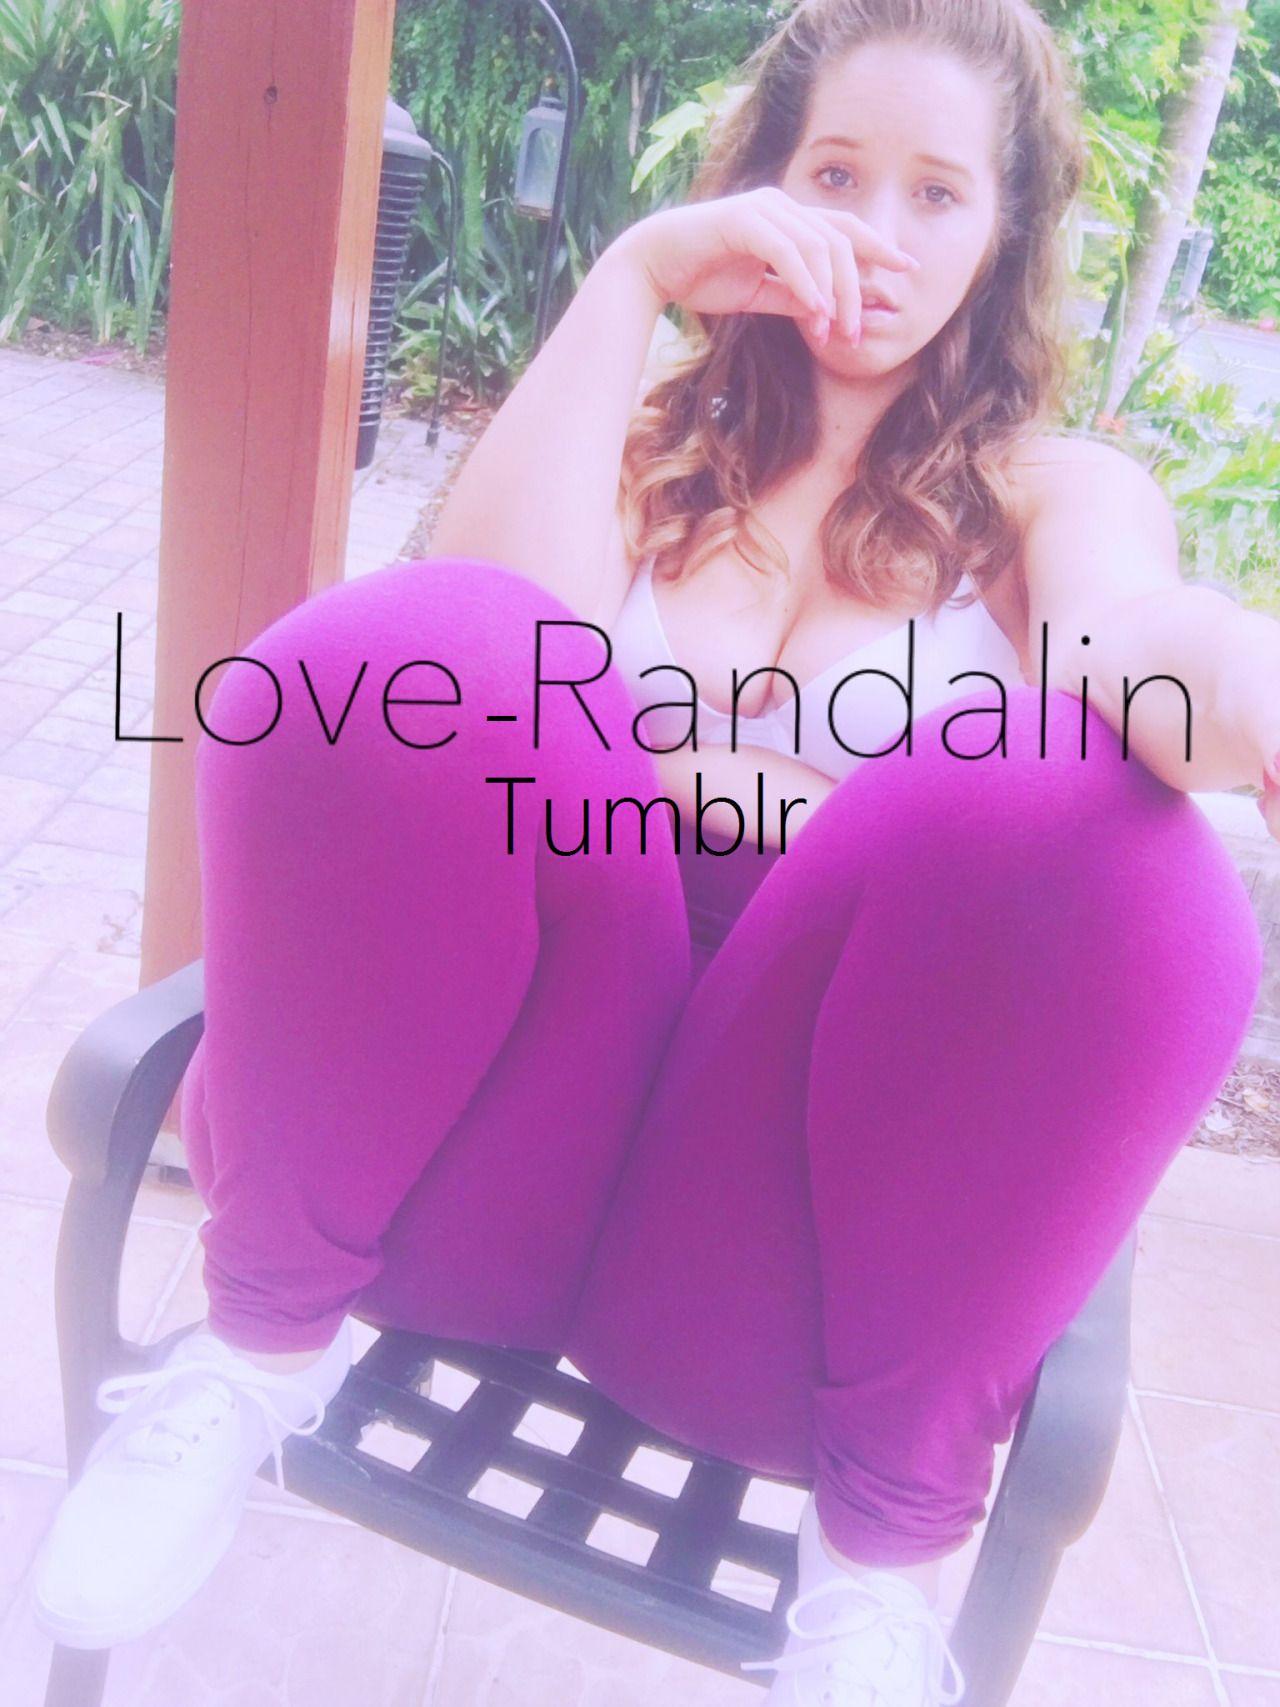 Loverandalin tumblr 3 - 2 part 4